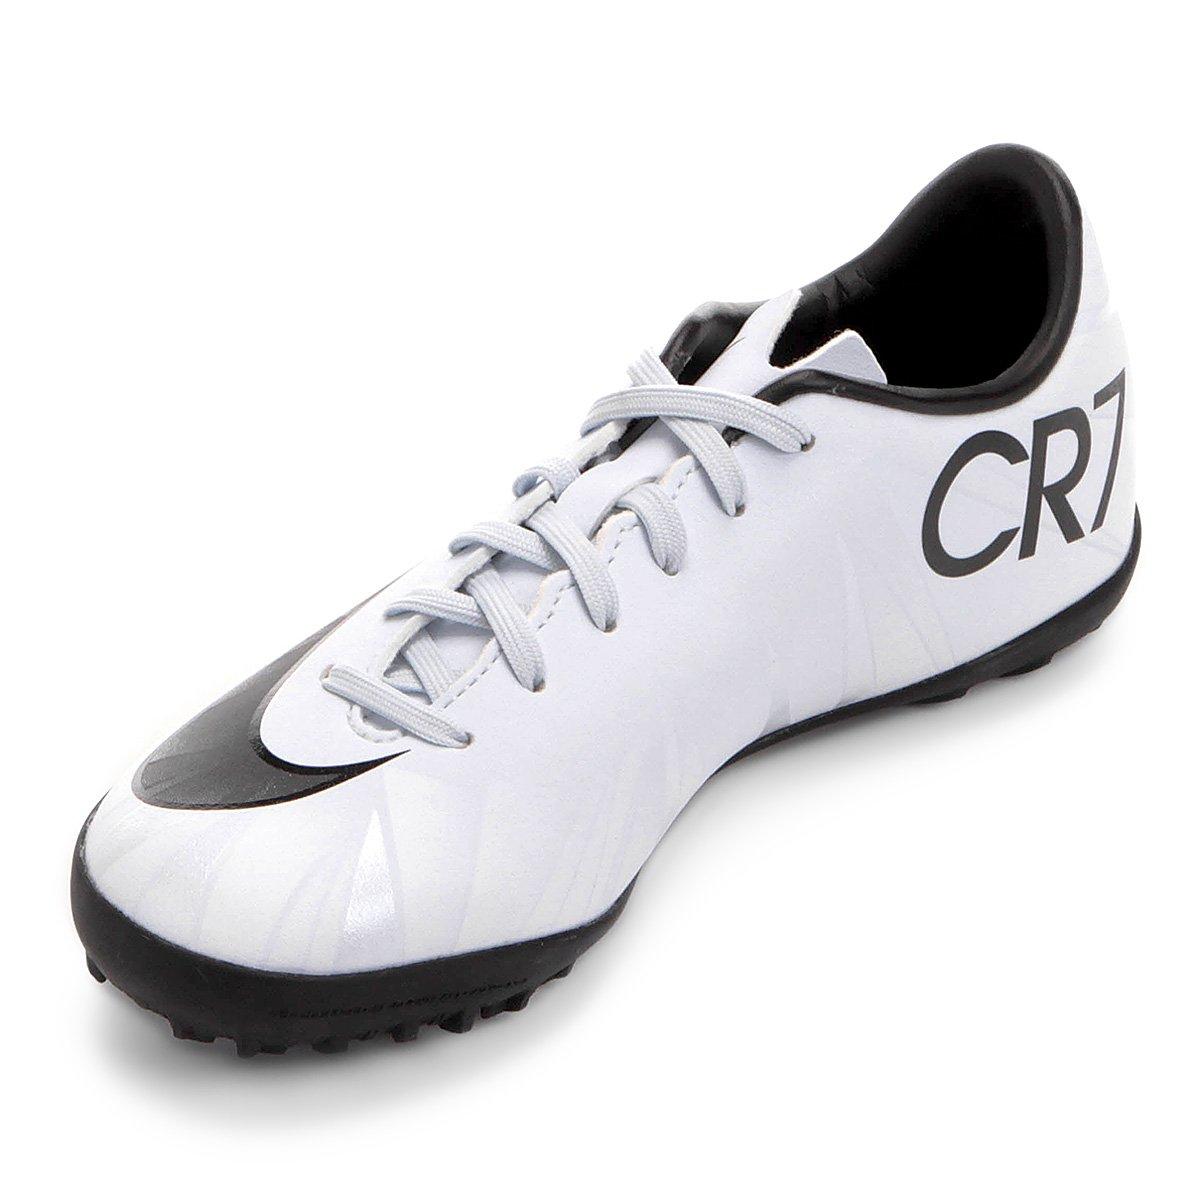 d71654b872 Chuteira Society Nike Mercurial Victory 6 CR7 DF TF Masculina